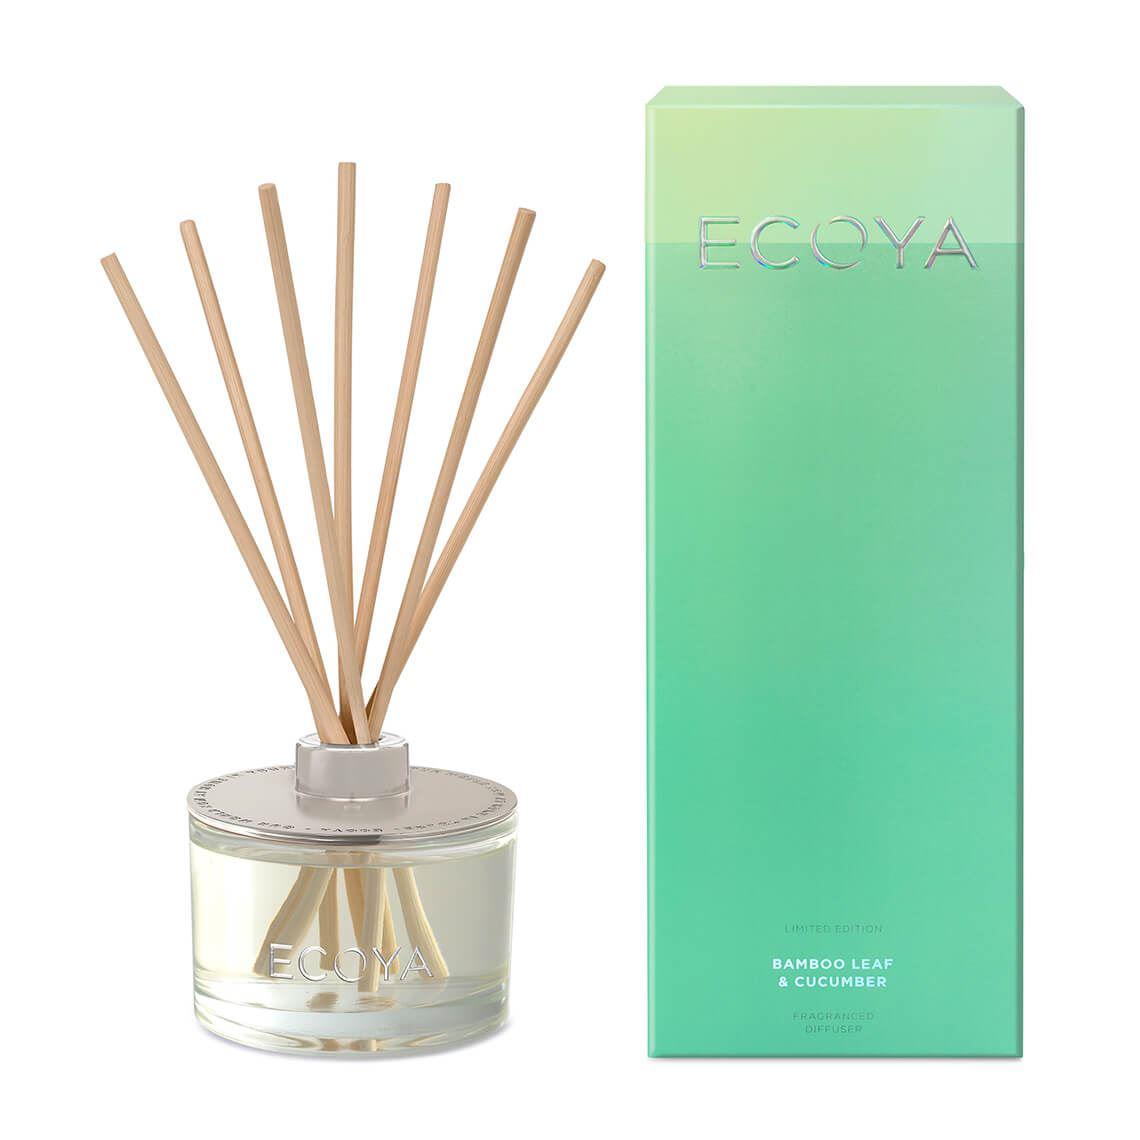 Ecoya Reed Diffuser Bamboo Leaf & Cucumber Size W 10cm x D 10cm x H 26cm in Bamboo Leaf/Cucumber Freedom